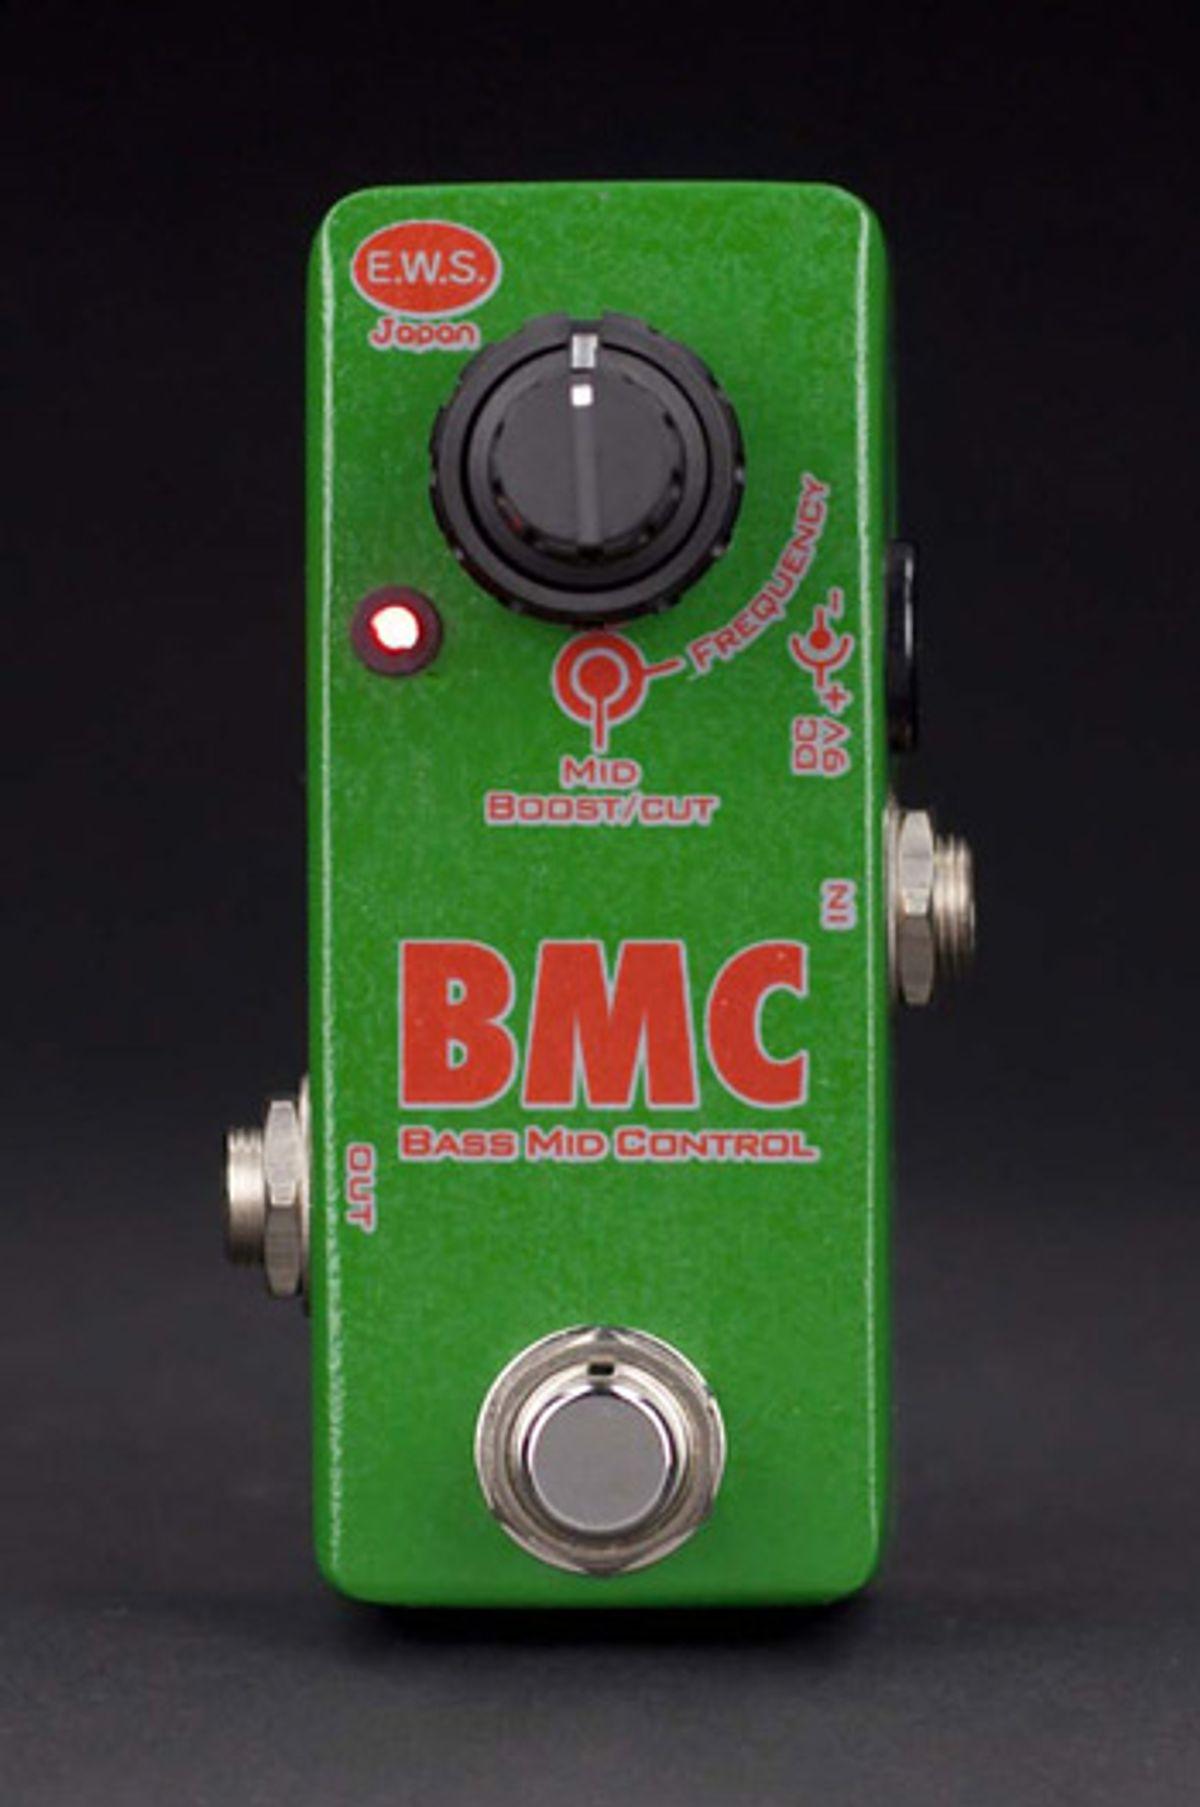 EWS Releases BMC Bass Mid Control Pedal